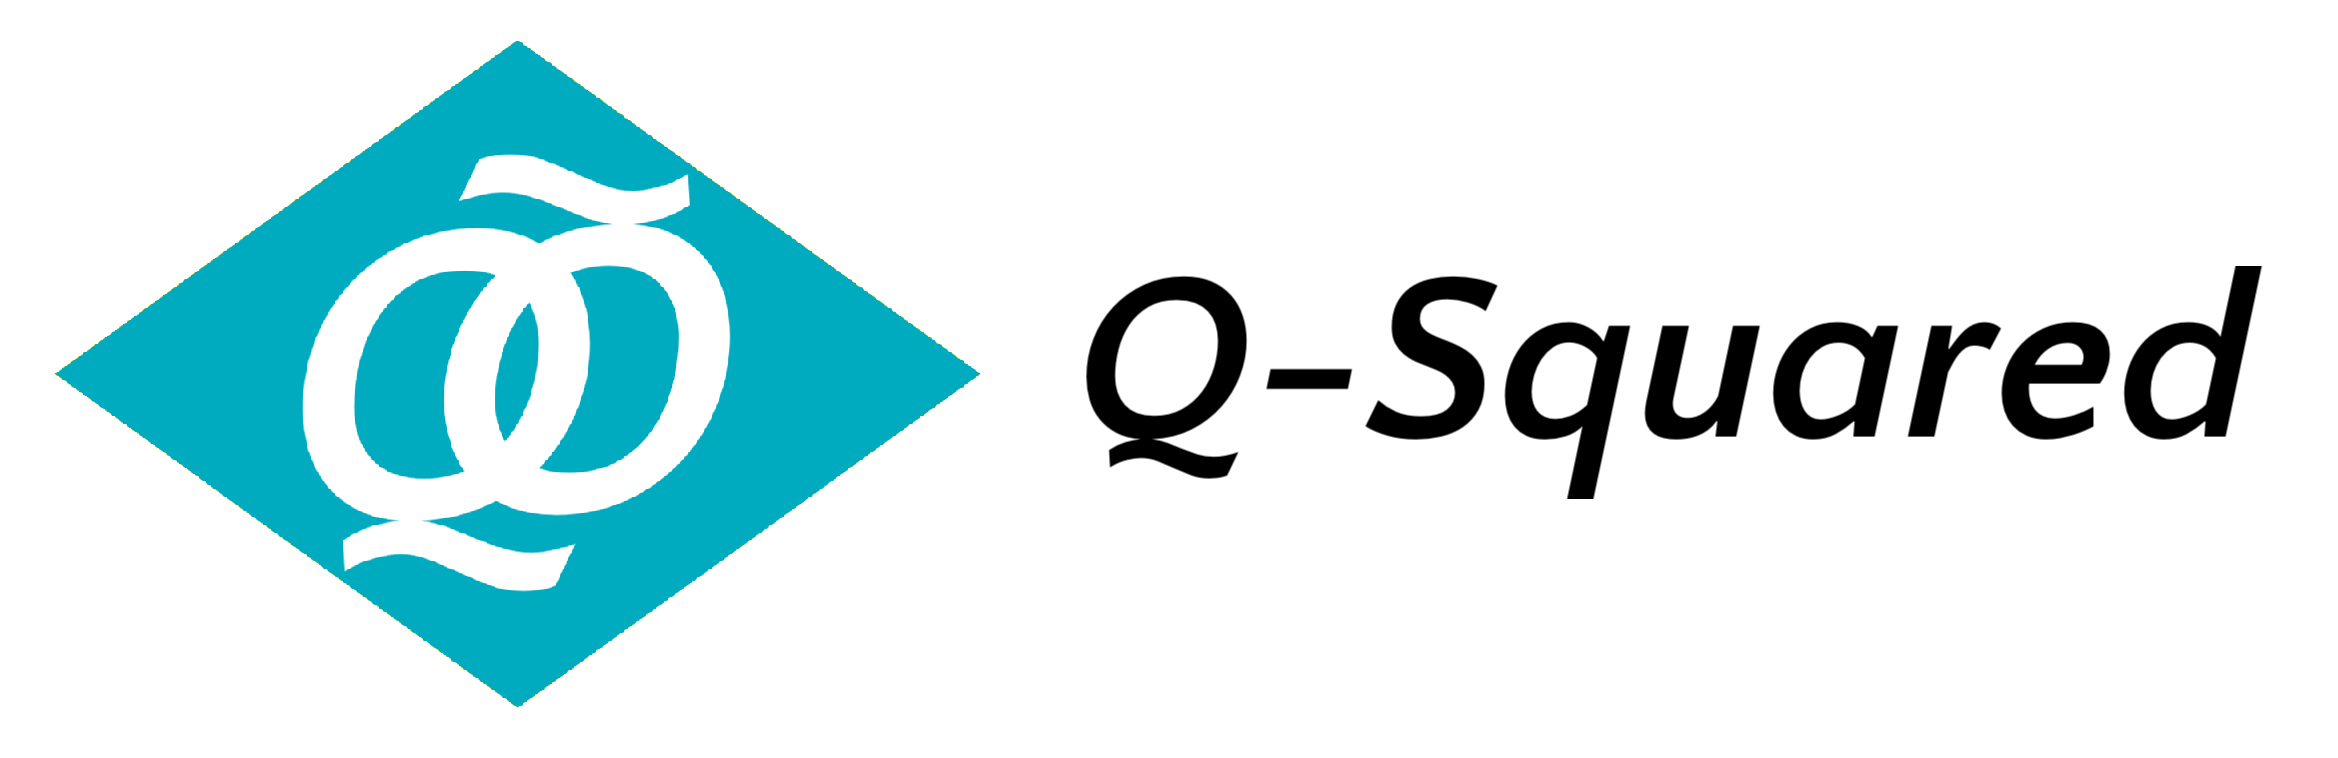 Q-Squared Technologies – キュースクエア・テクノロジーズ株式会社